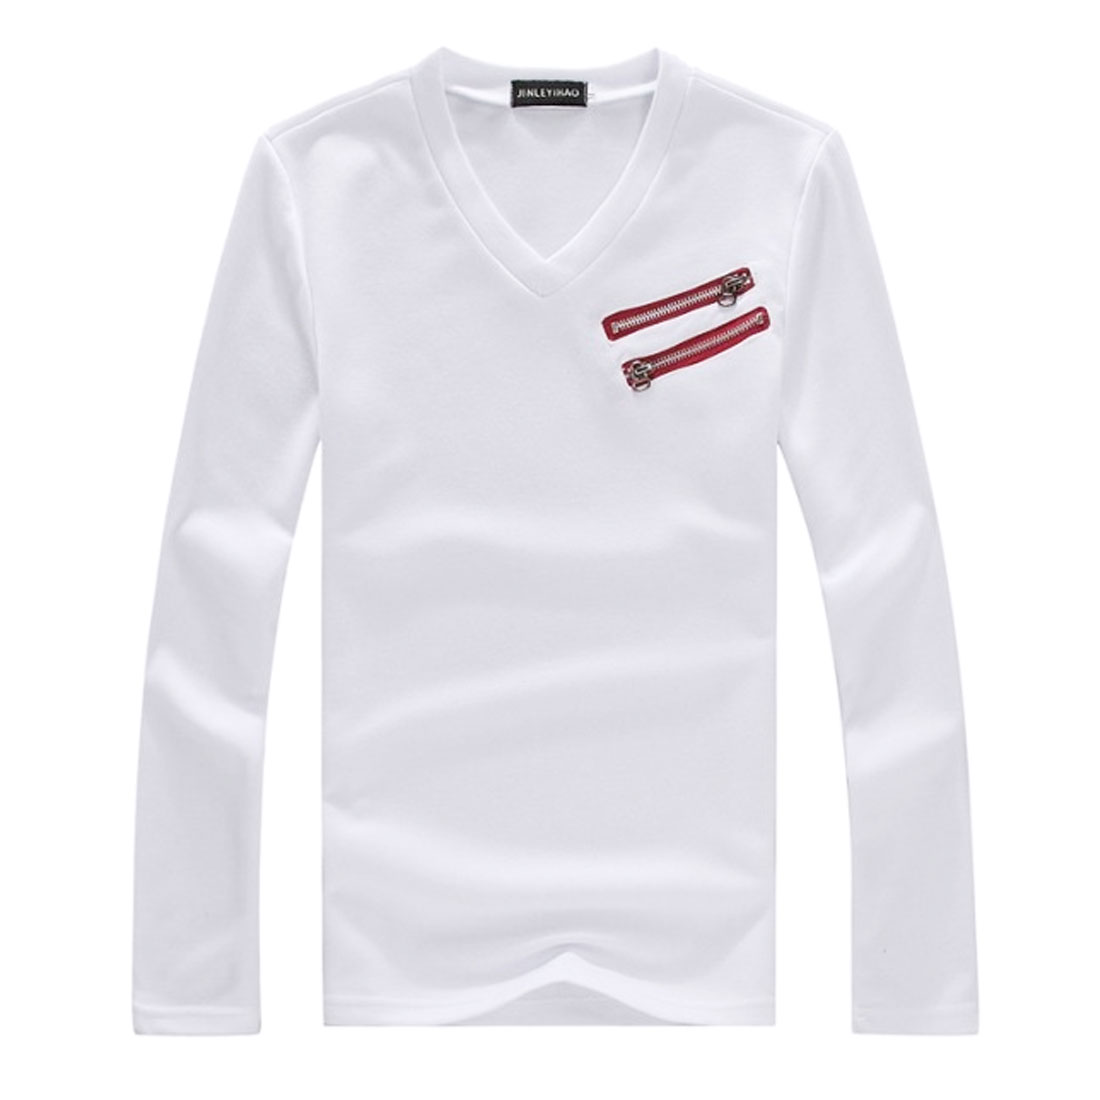 Stylish White V Neckline Long Sleeve Slant Zipper Decor Front Shirt for Man S